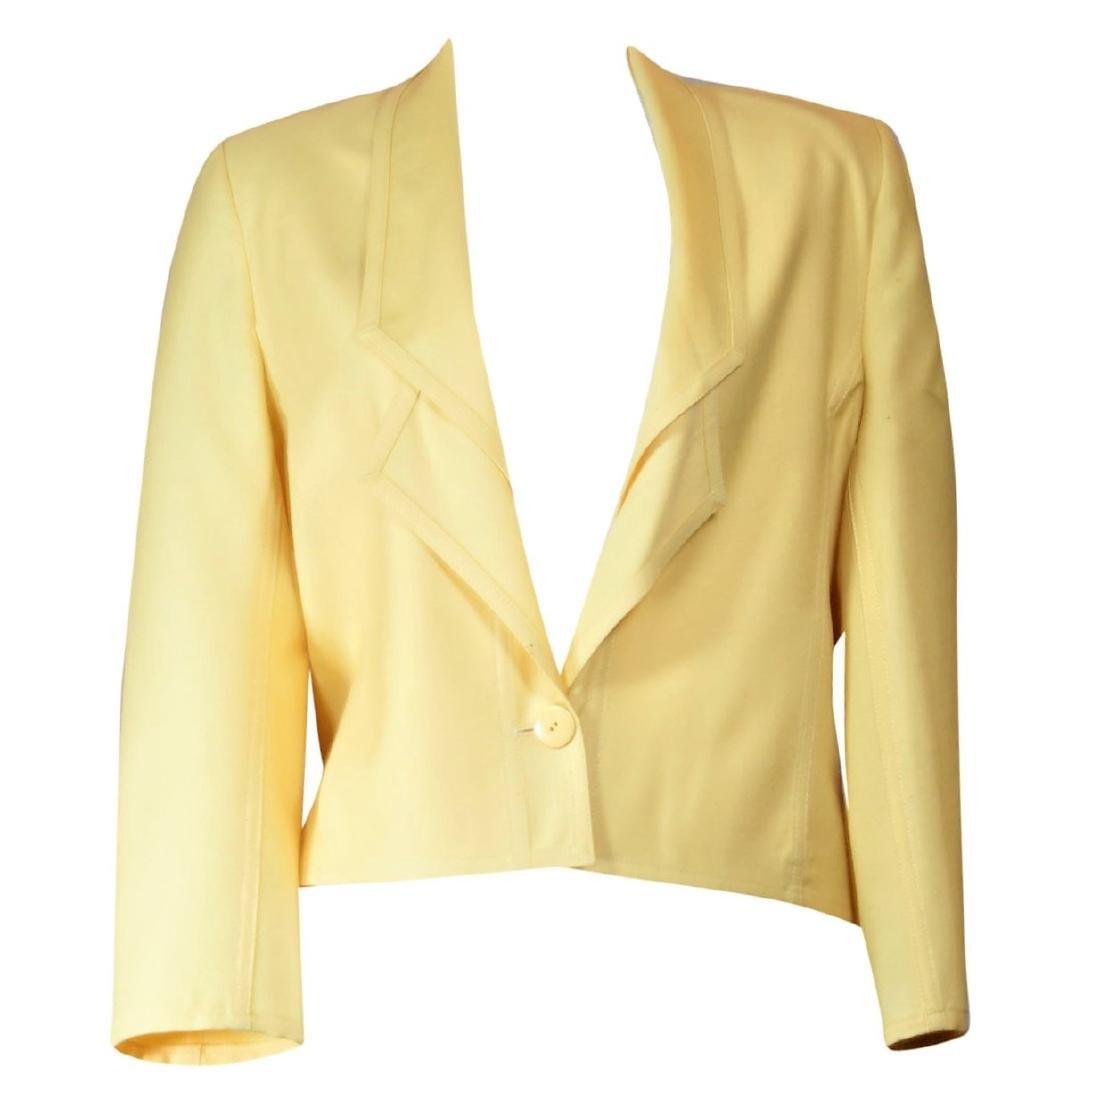 Louis Feraud Yellow Eton Jacket